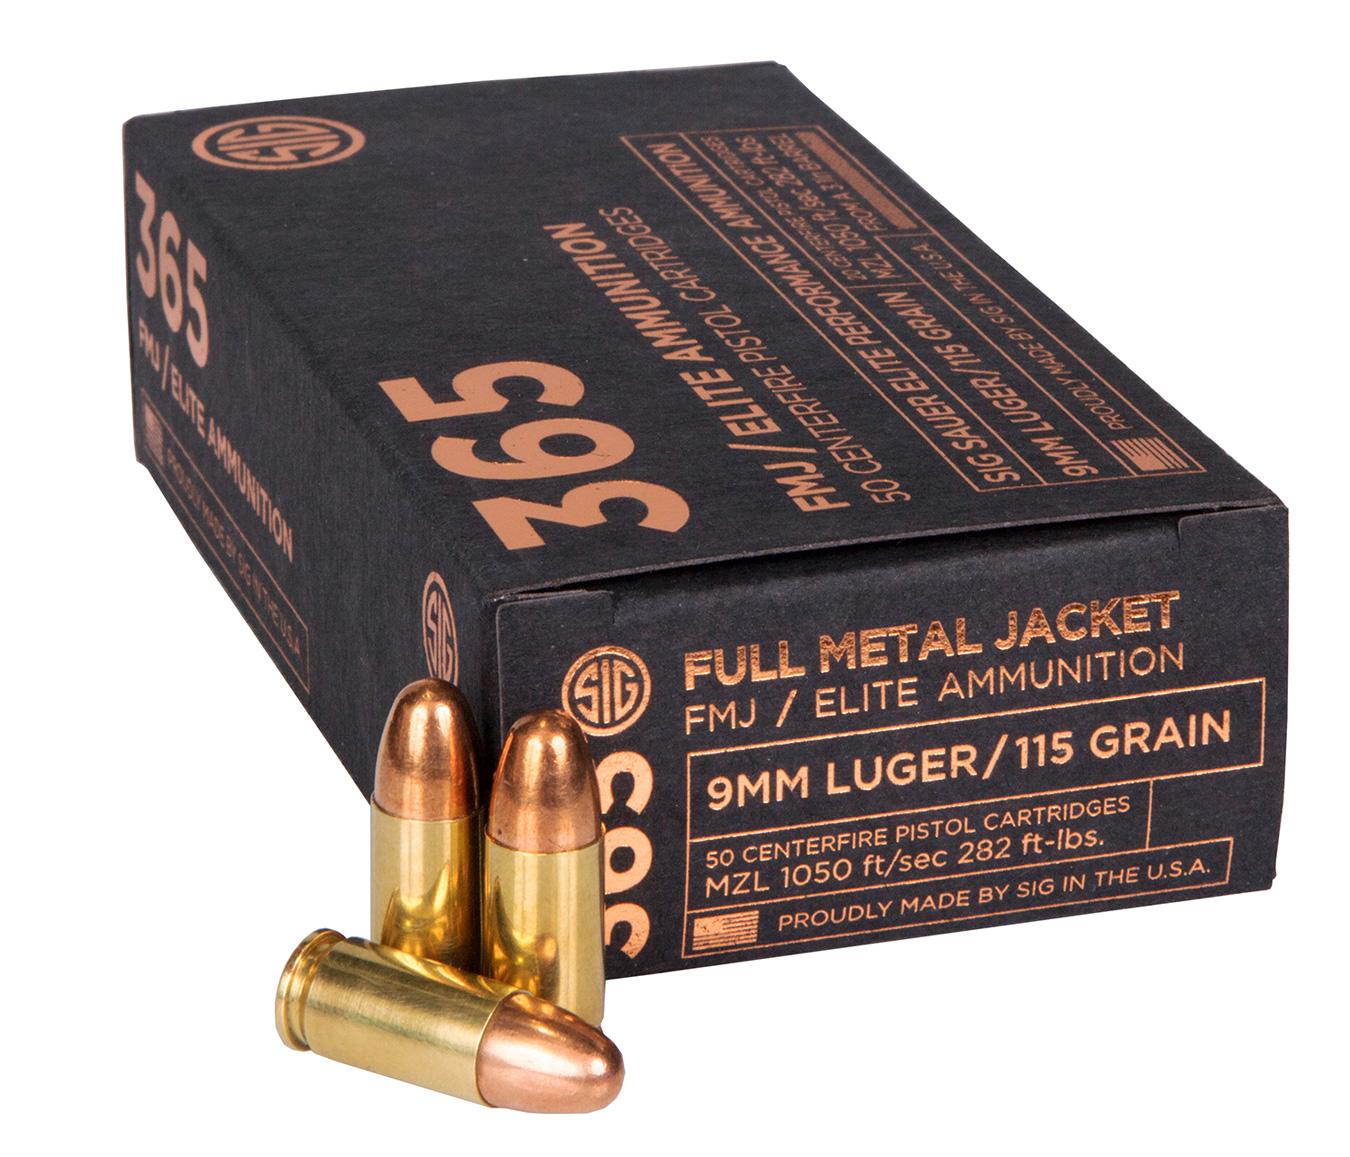 SIG 365 full metal jacket ammunition box